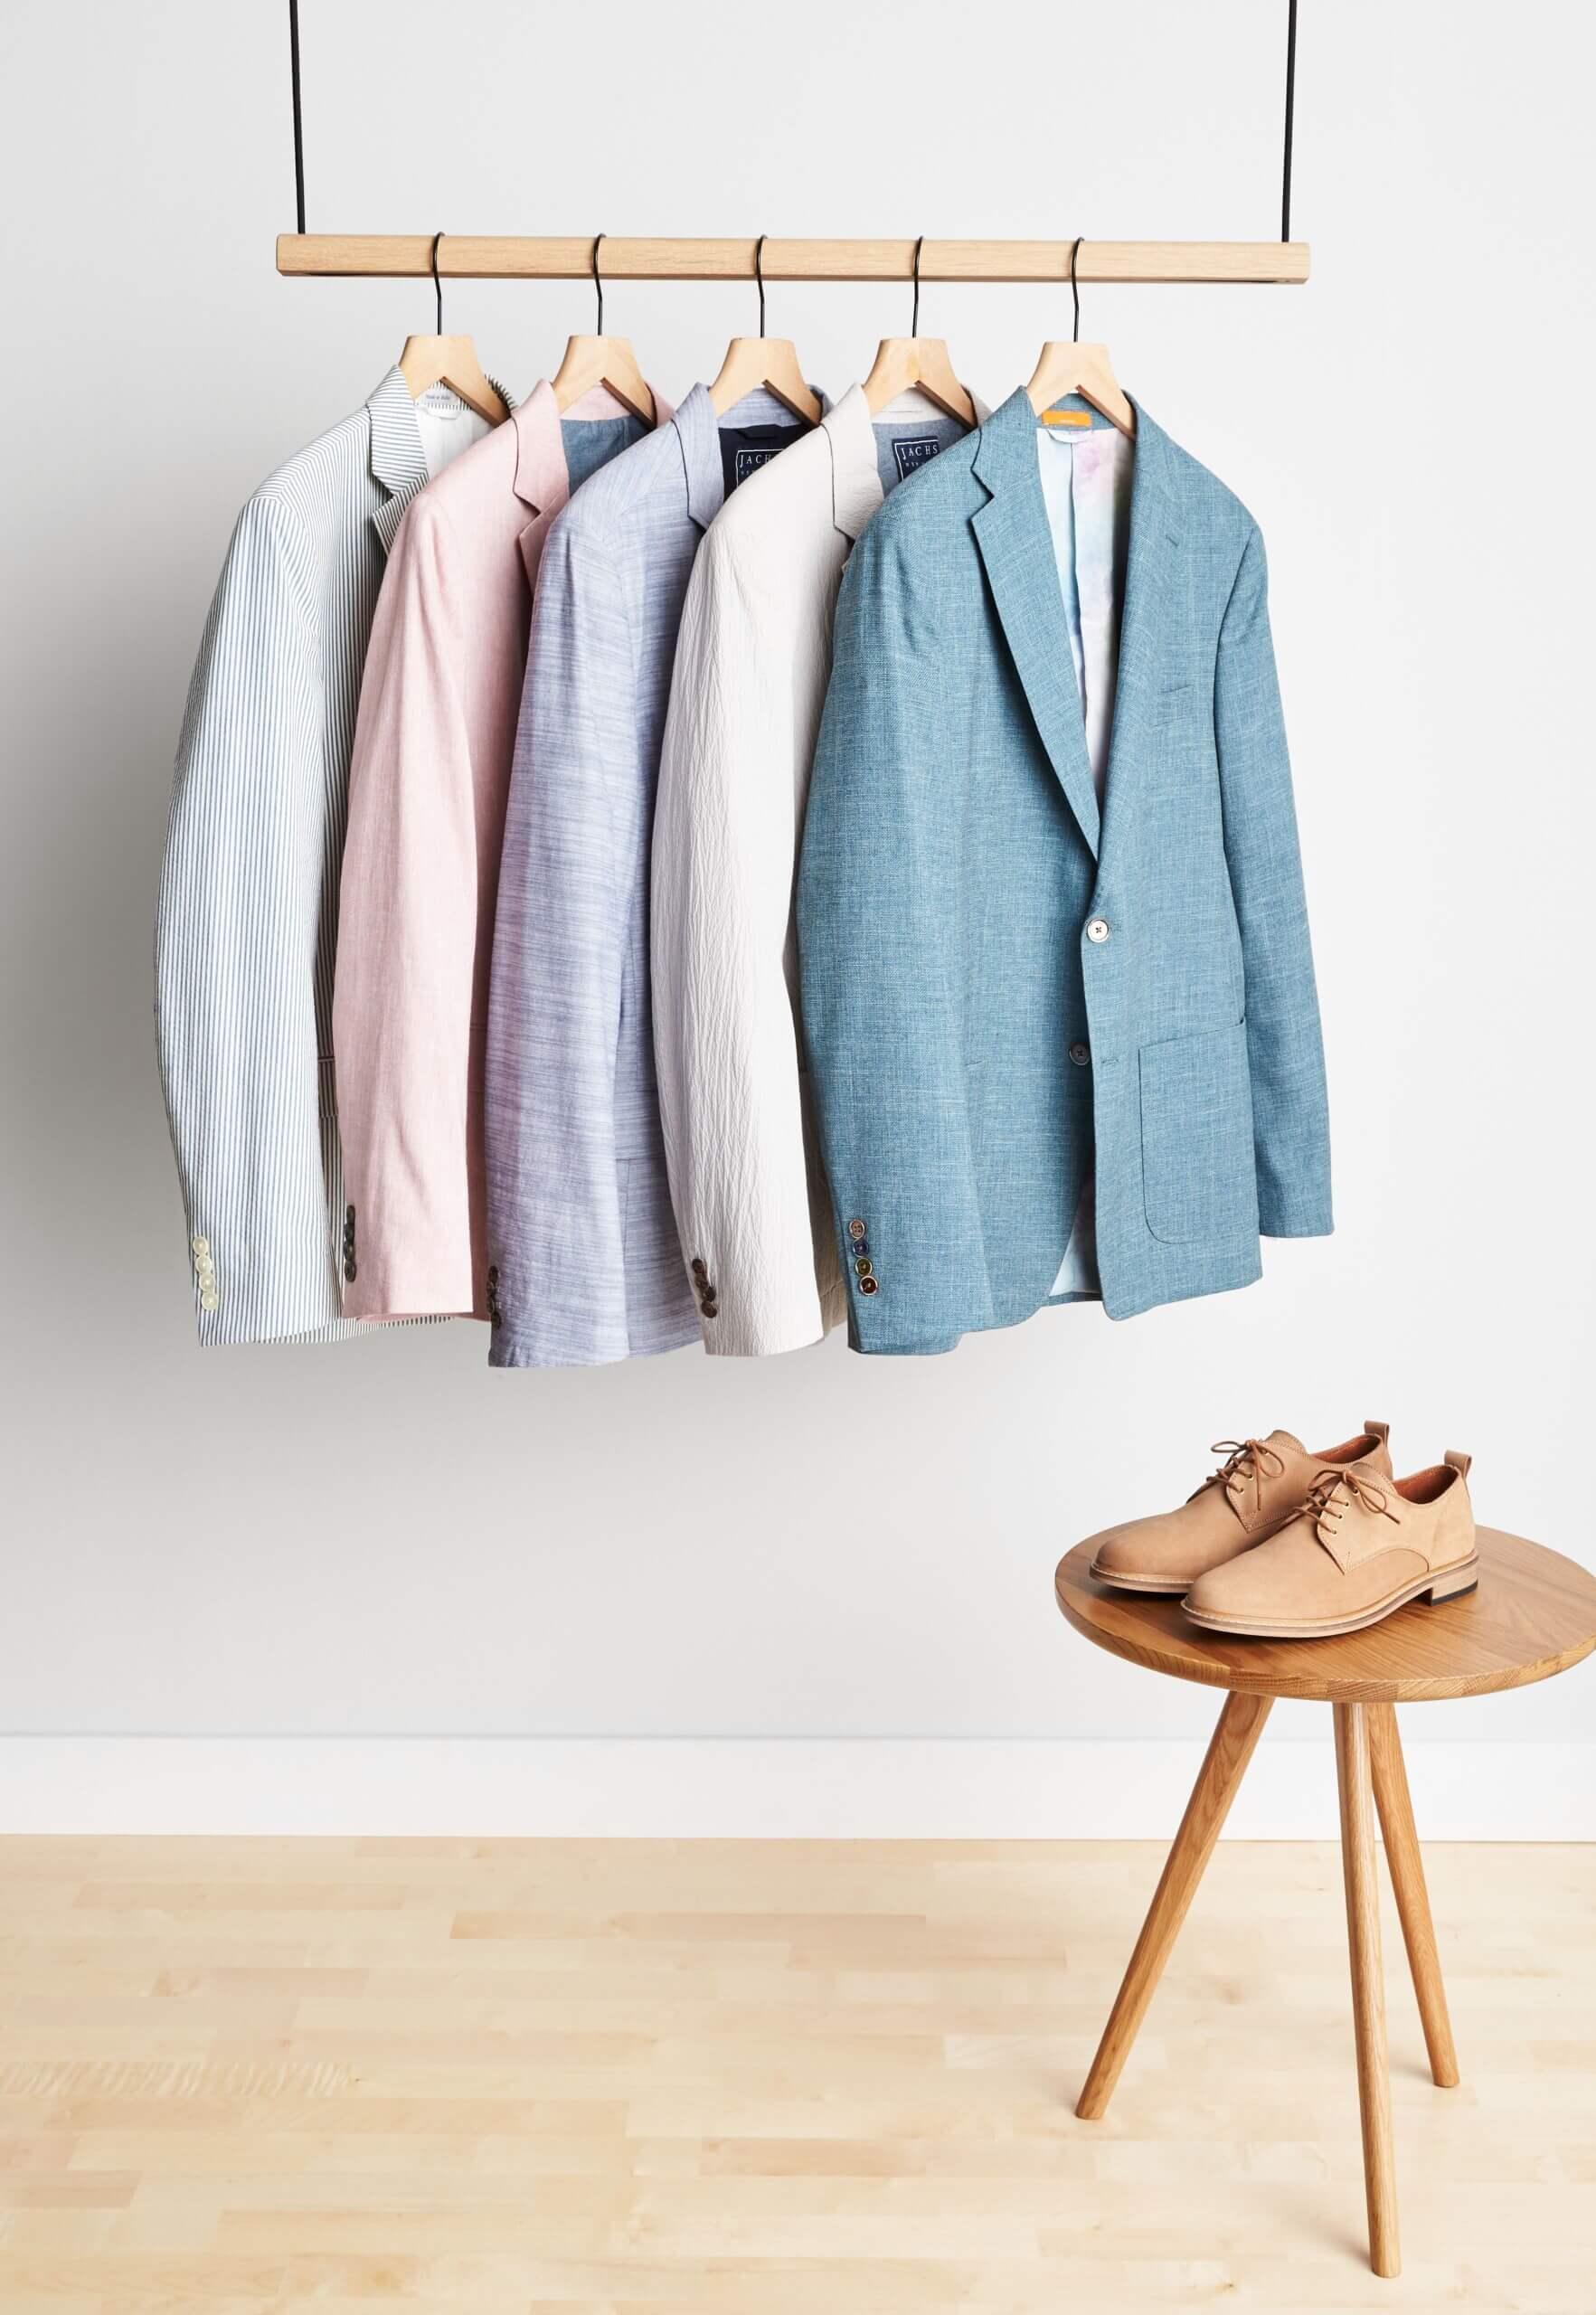 Stitch Fix Men's Wedding blazers in seersucker print, light pink, light purple, grey, blue and featuring a a pair of beige brogues.